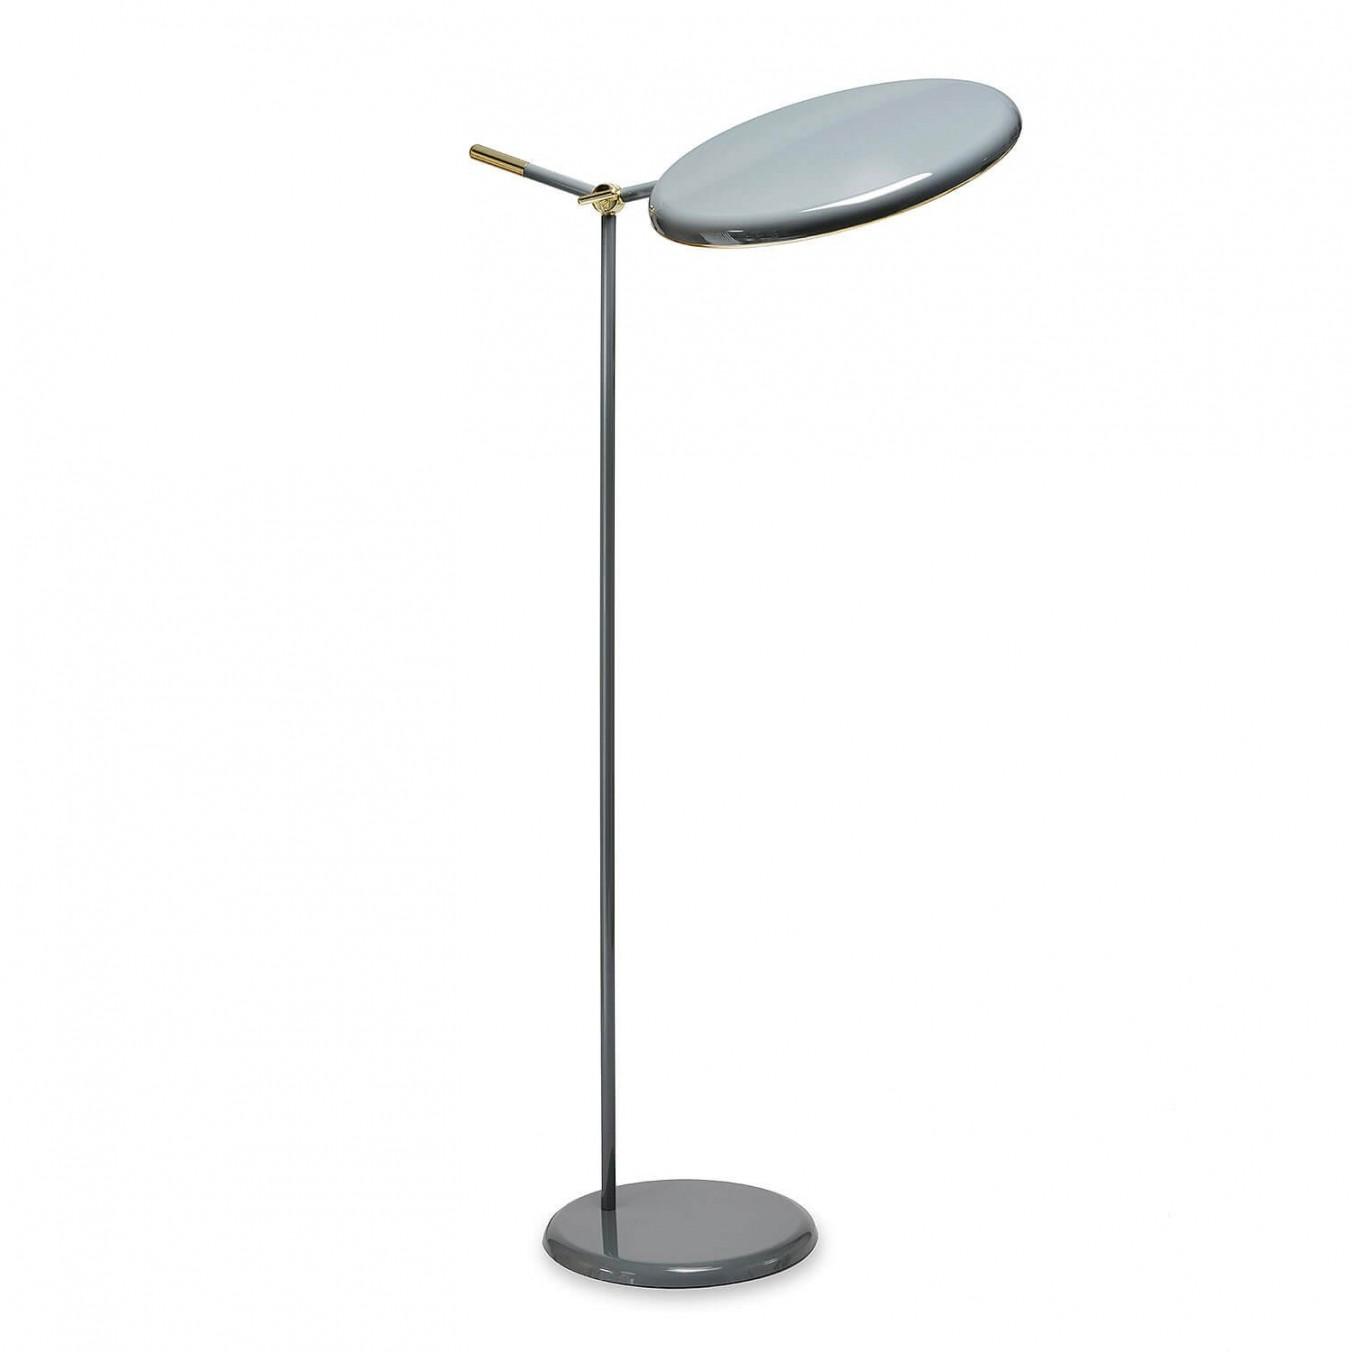 Full Moon Floor Lamp